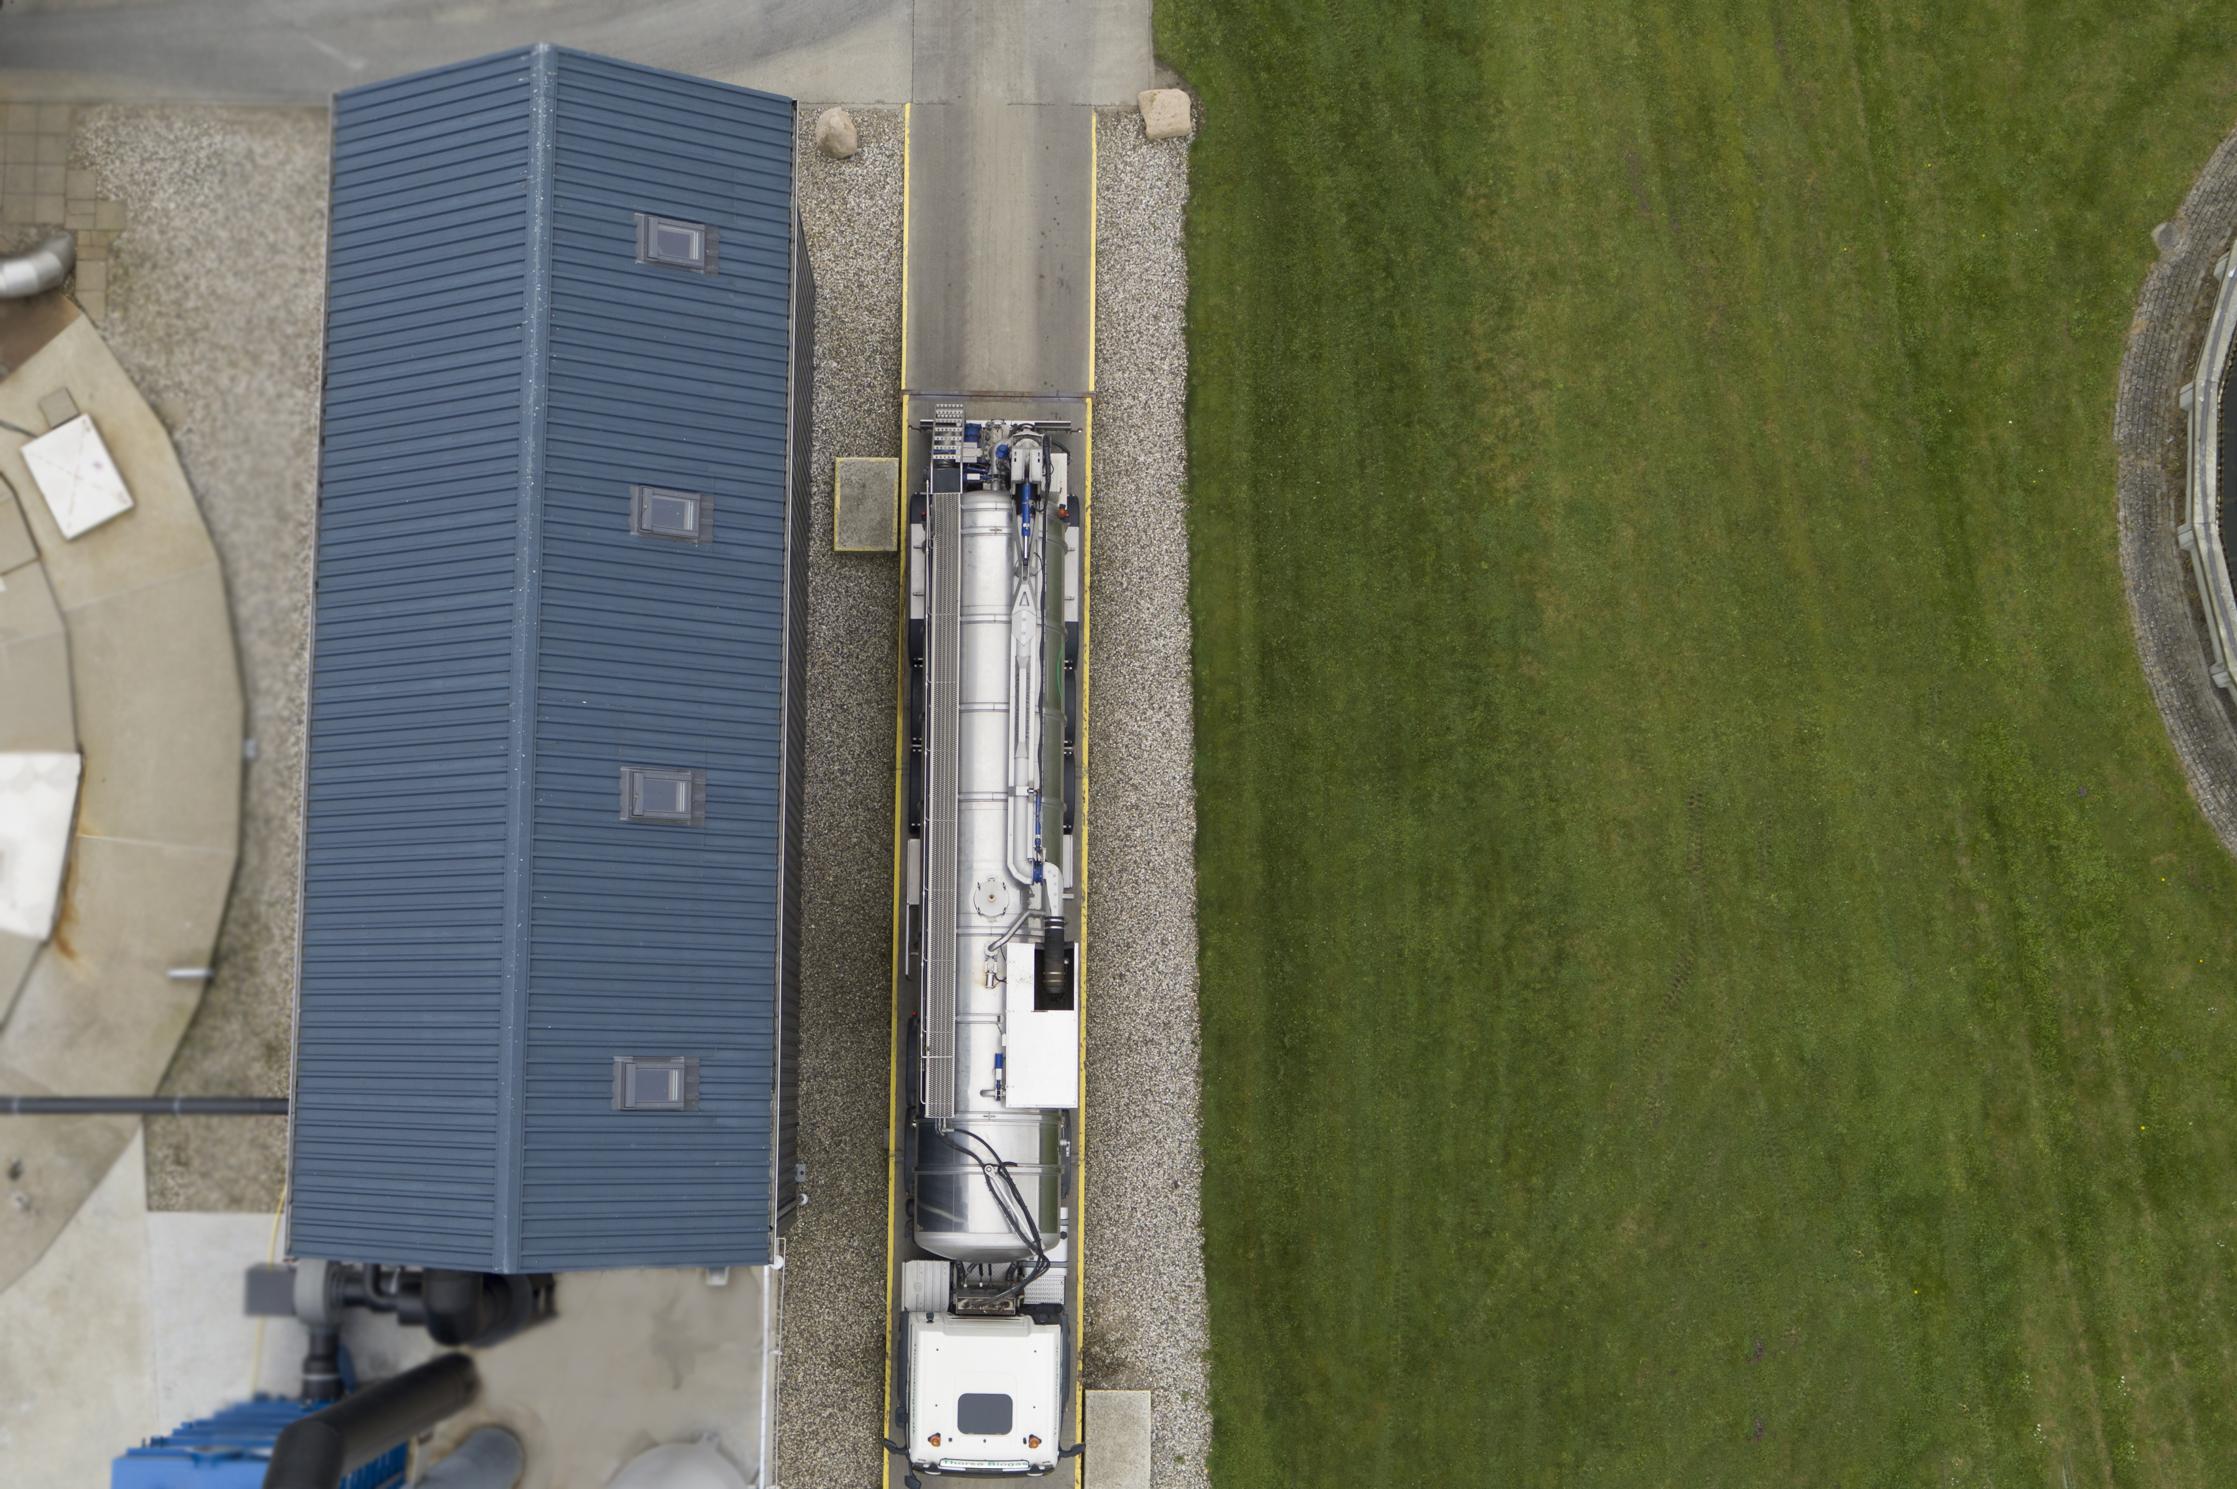 Transport biogas